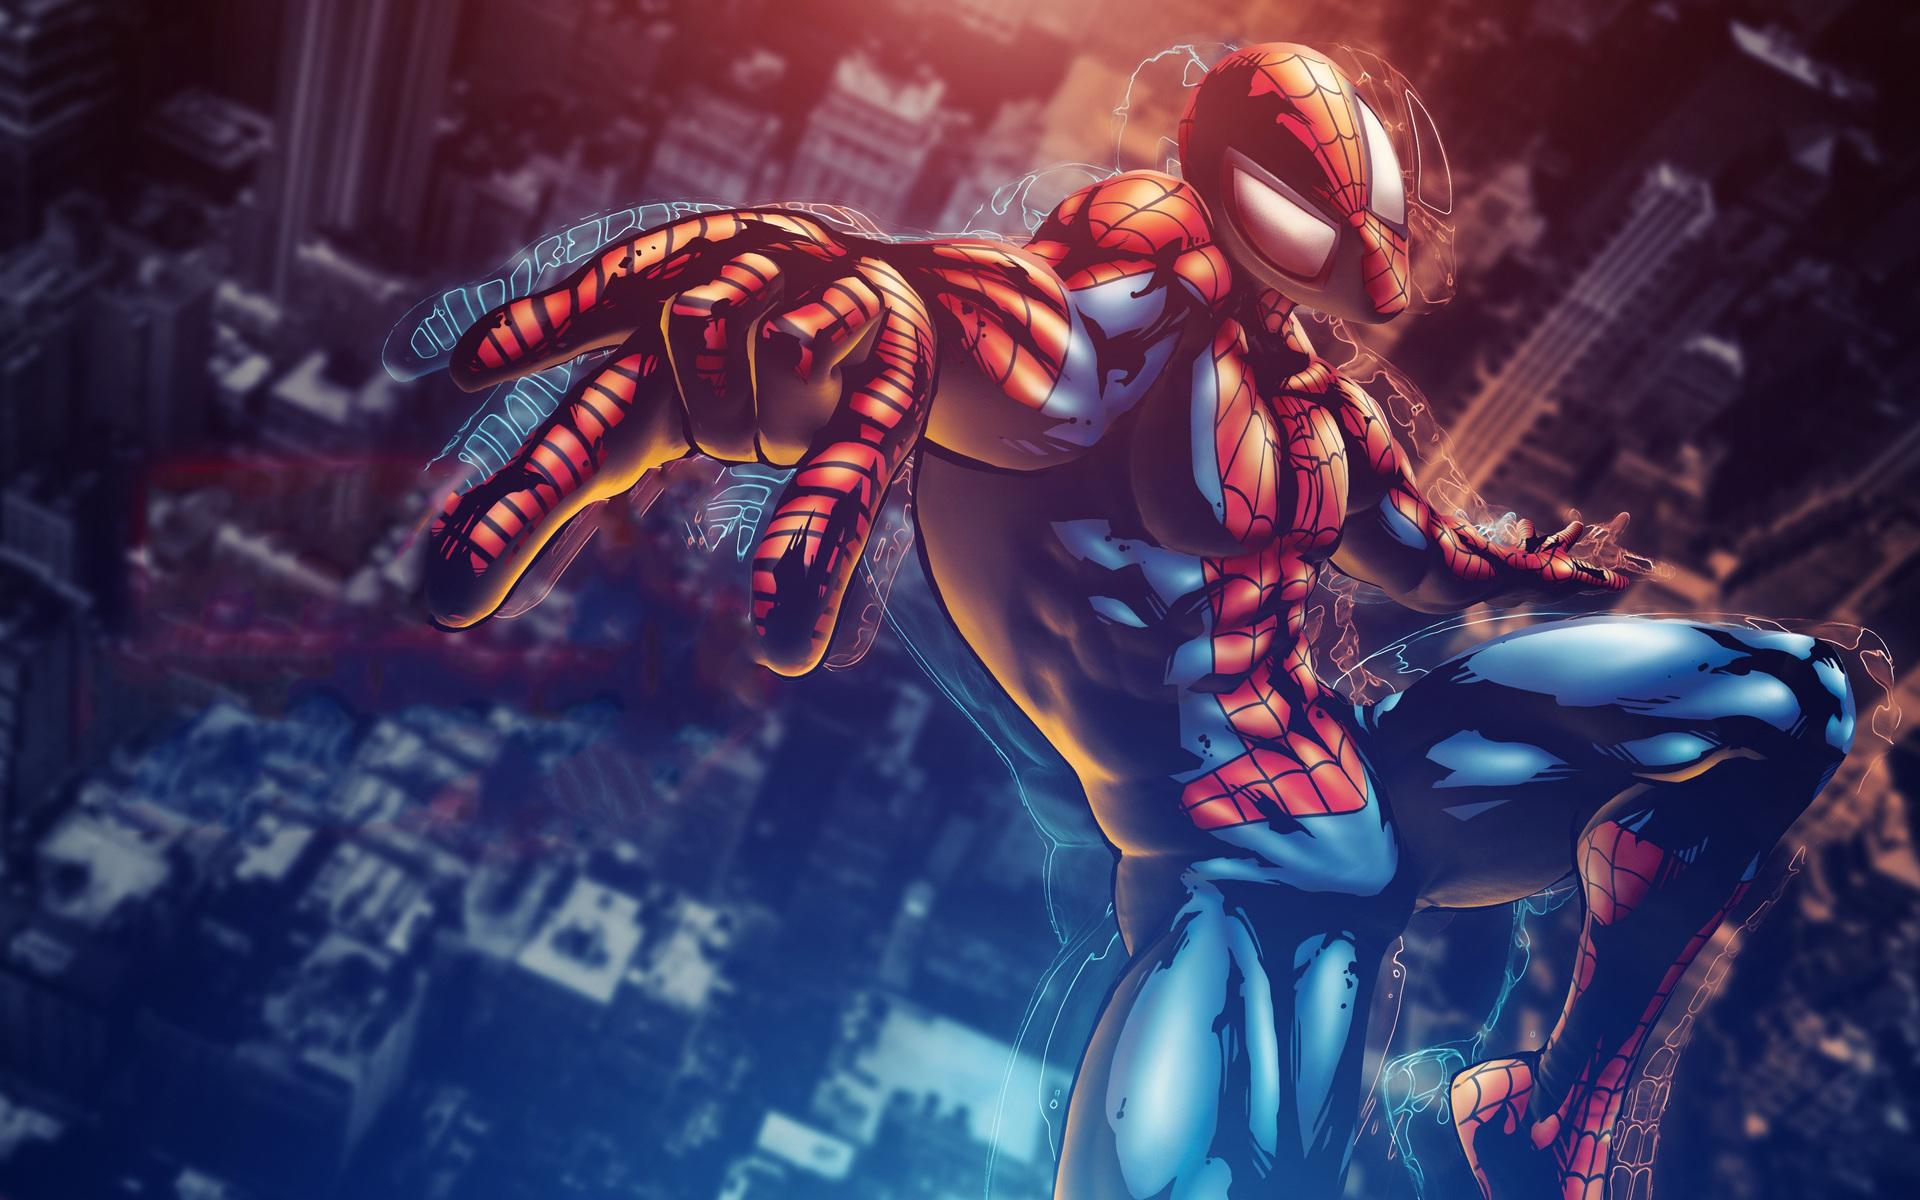 1920x1200 Marvel Vs Capcom 3 Spiderman 4k 1080p Resolution Hd 4k